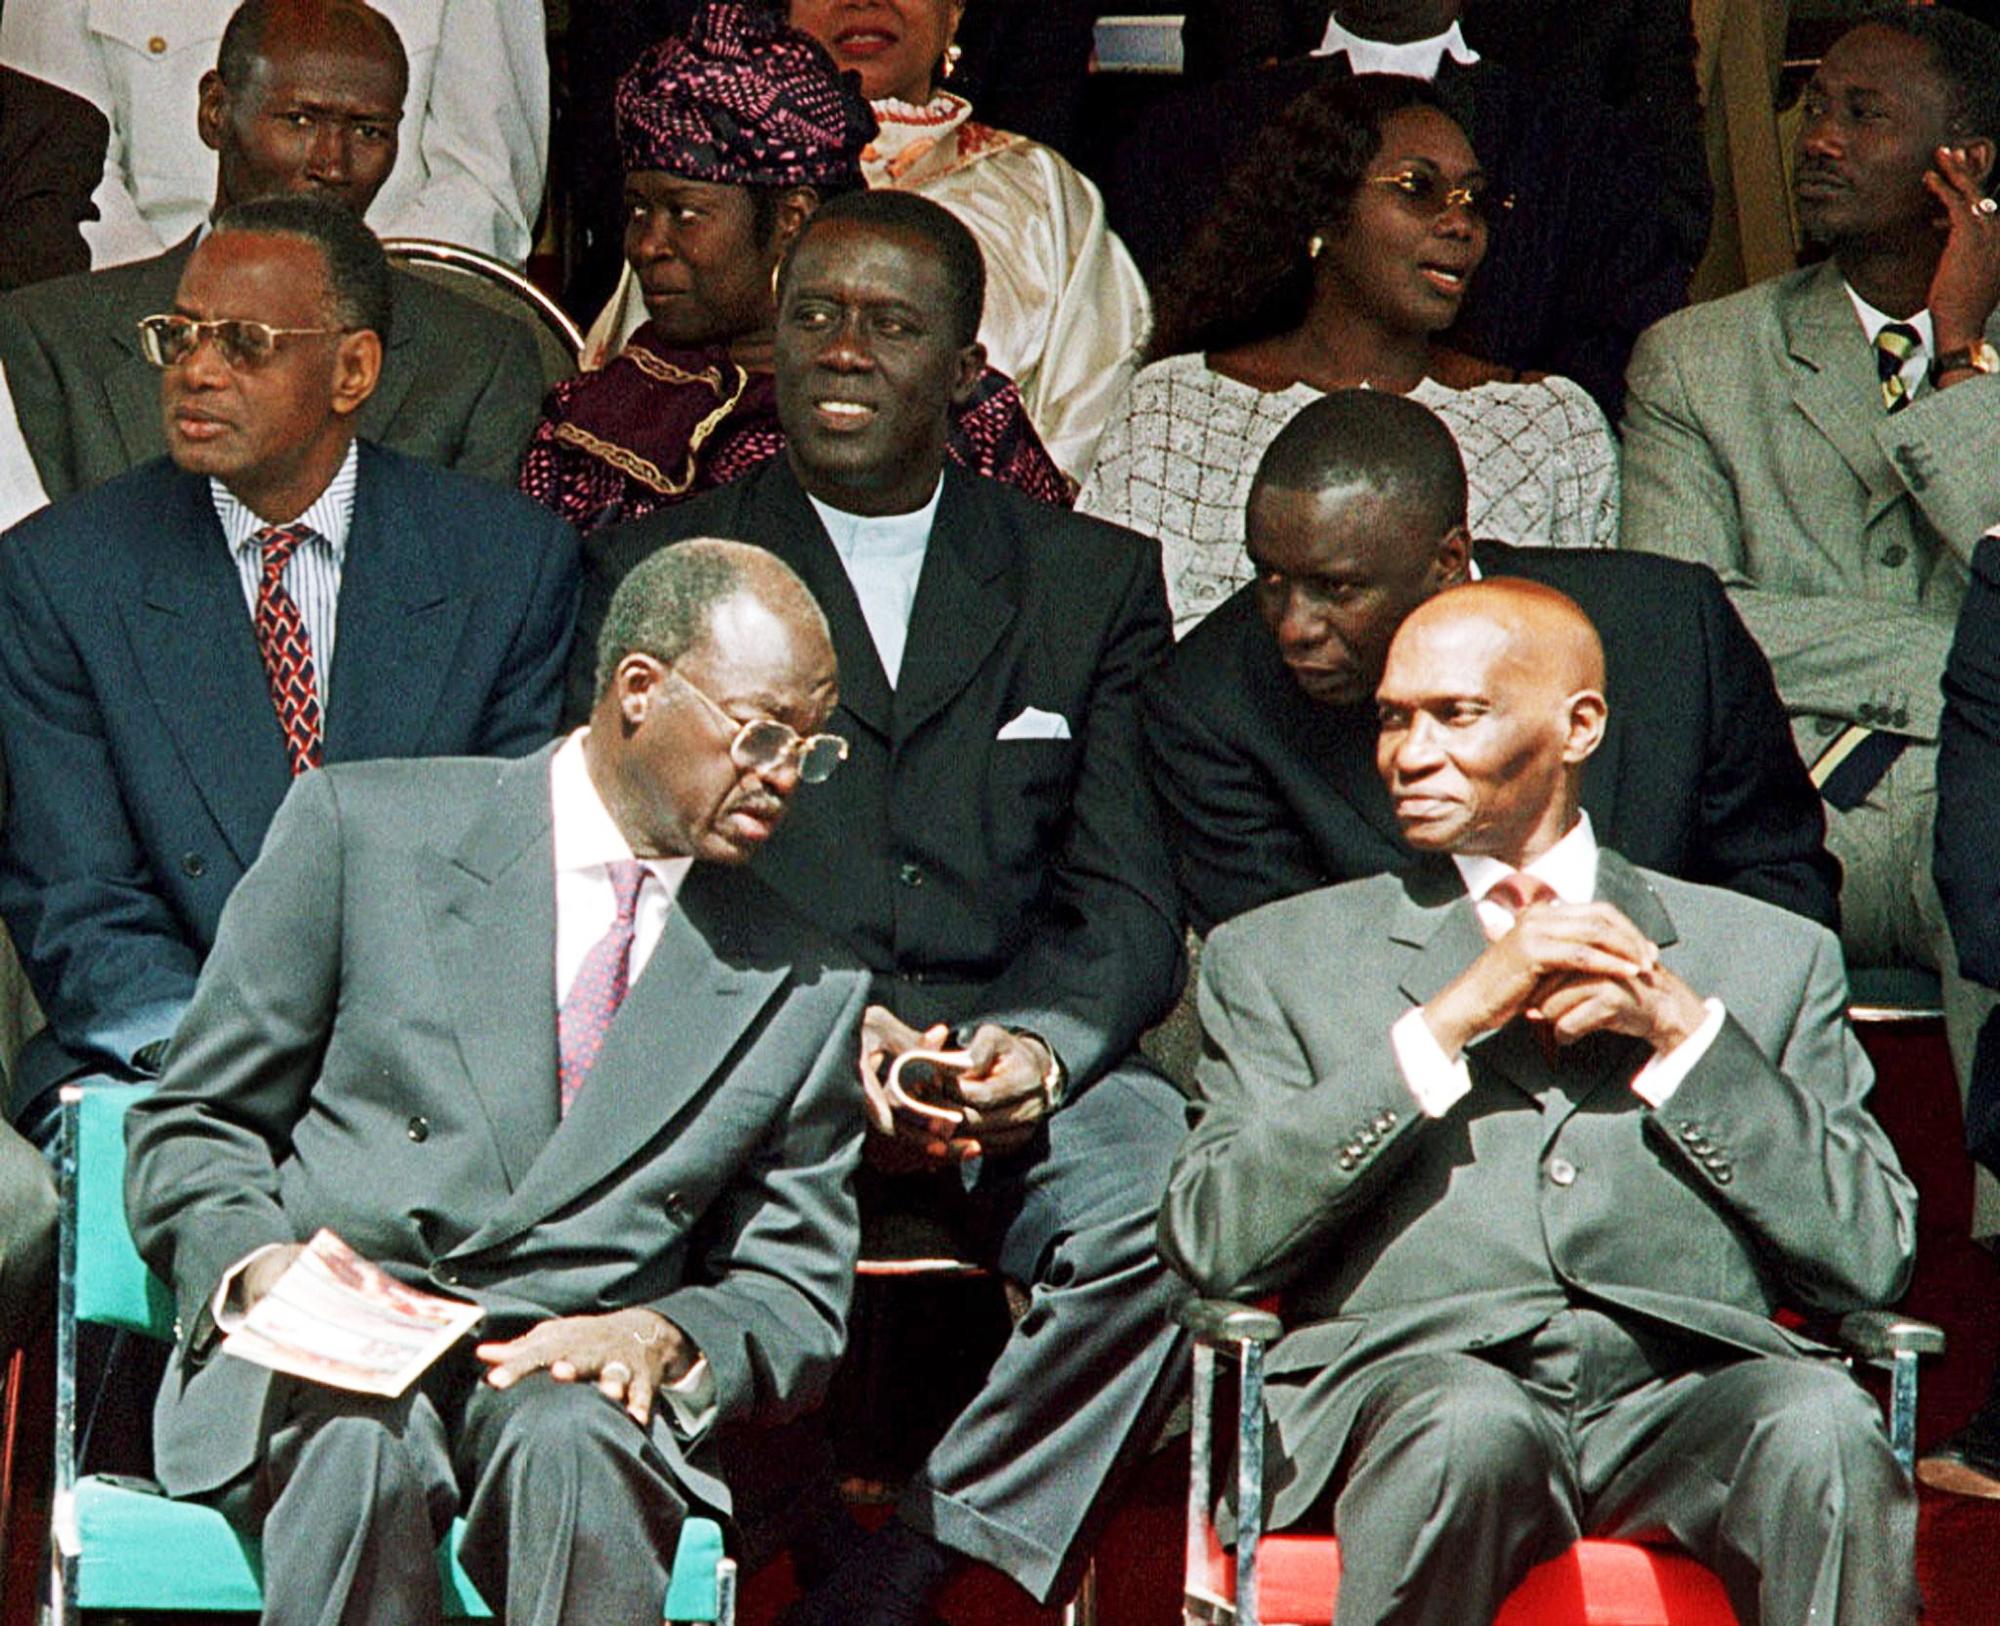 Avec Abdoulaye Wade et Idrissa Seck, le 4avril 2000, à Dakar.